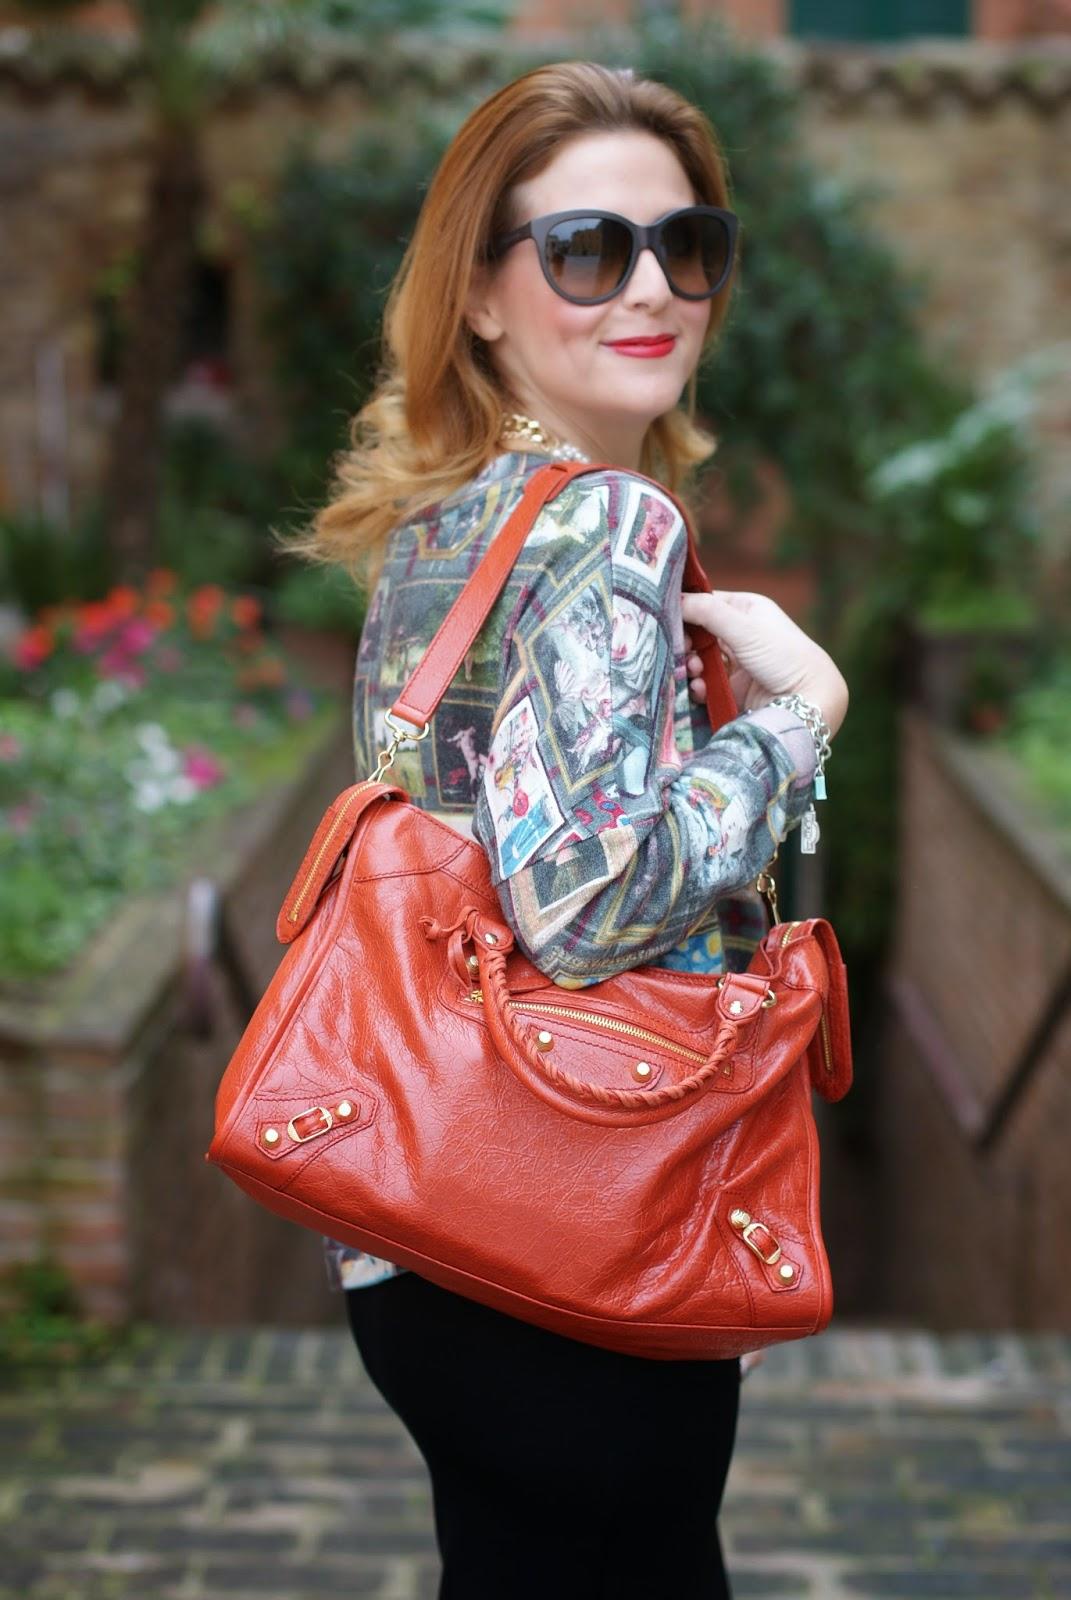 Asos midi pencil skirt, Balenciaga City bag, Zara pearls necklace, Fashion and Cookies, fashion blogger